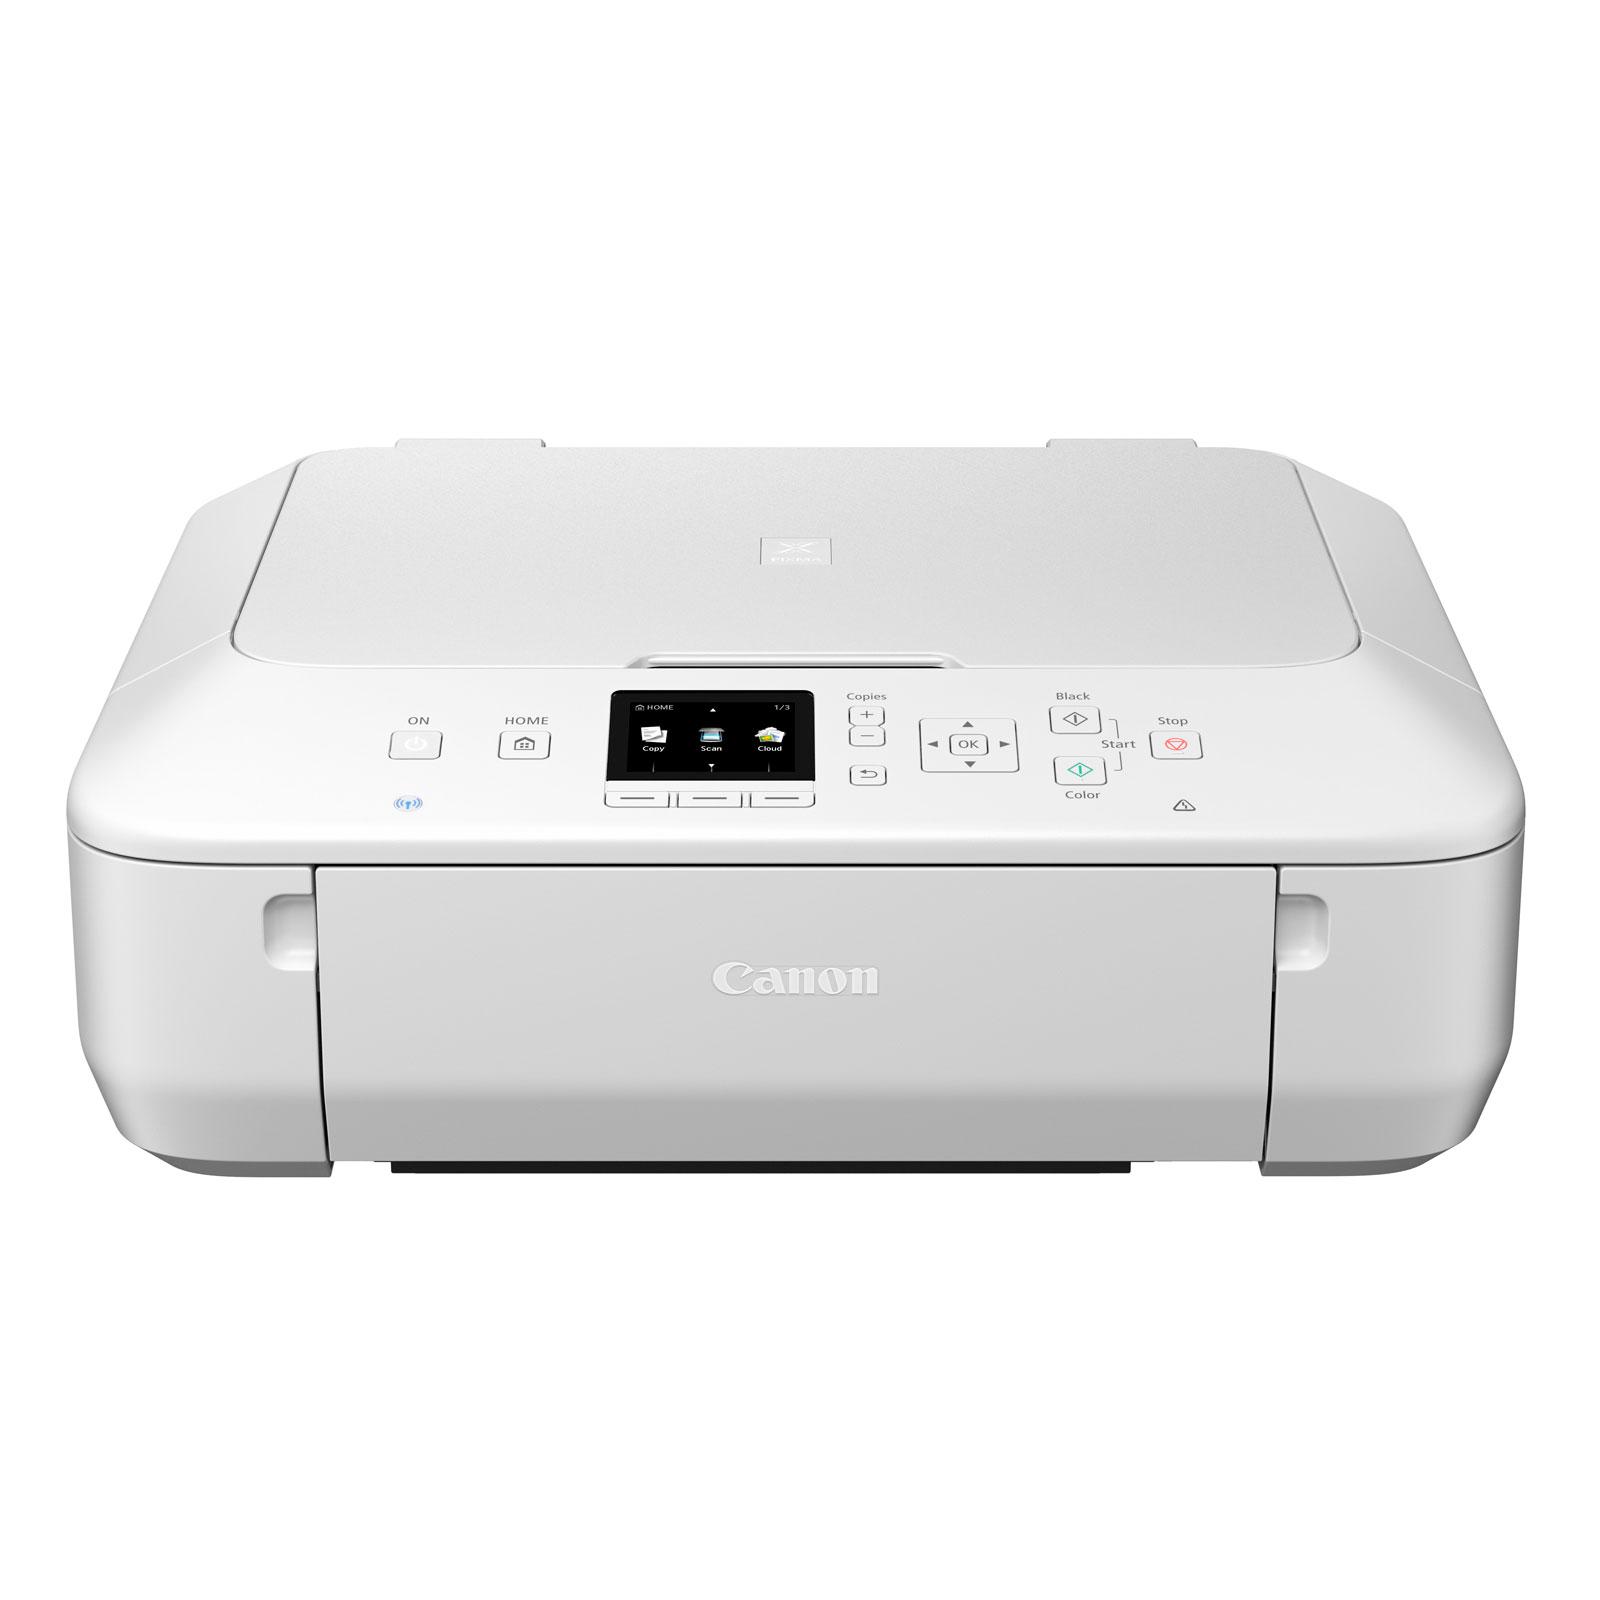 canon pixma mg5650 blanche imprimante multifonction canon sur. Black Bedroom Furniture Sets. Home Design Ideas